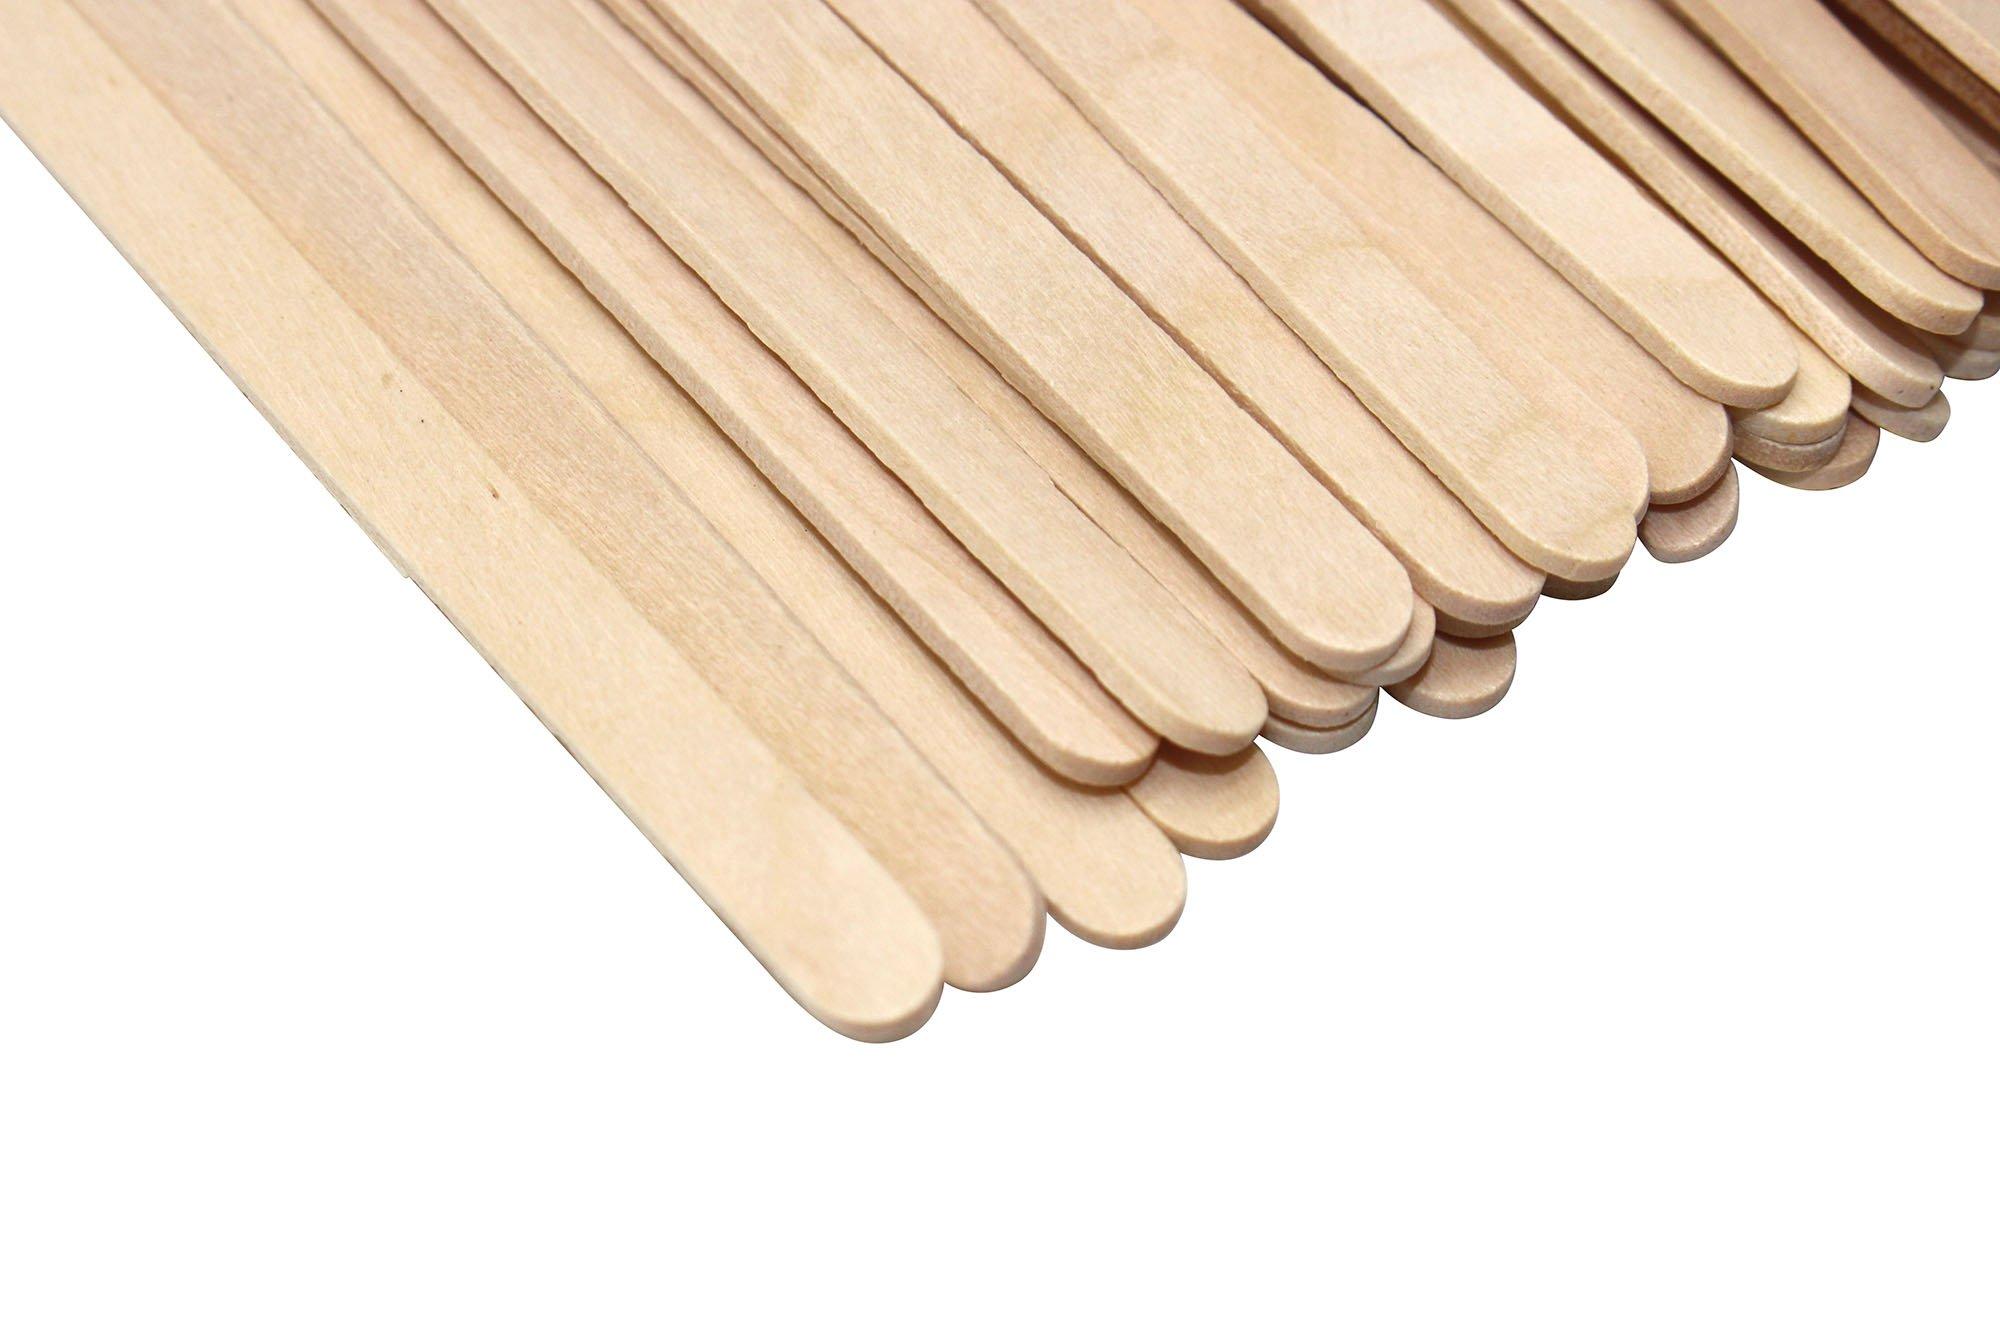 Disposable Birch Wood Coffee Stir Sticks Stirrers Wooden Tea Stir Stick Stirrer,7.5 Inch (1000Pcs) by Jinliang (Image #2)